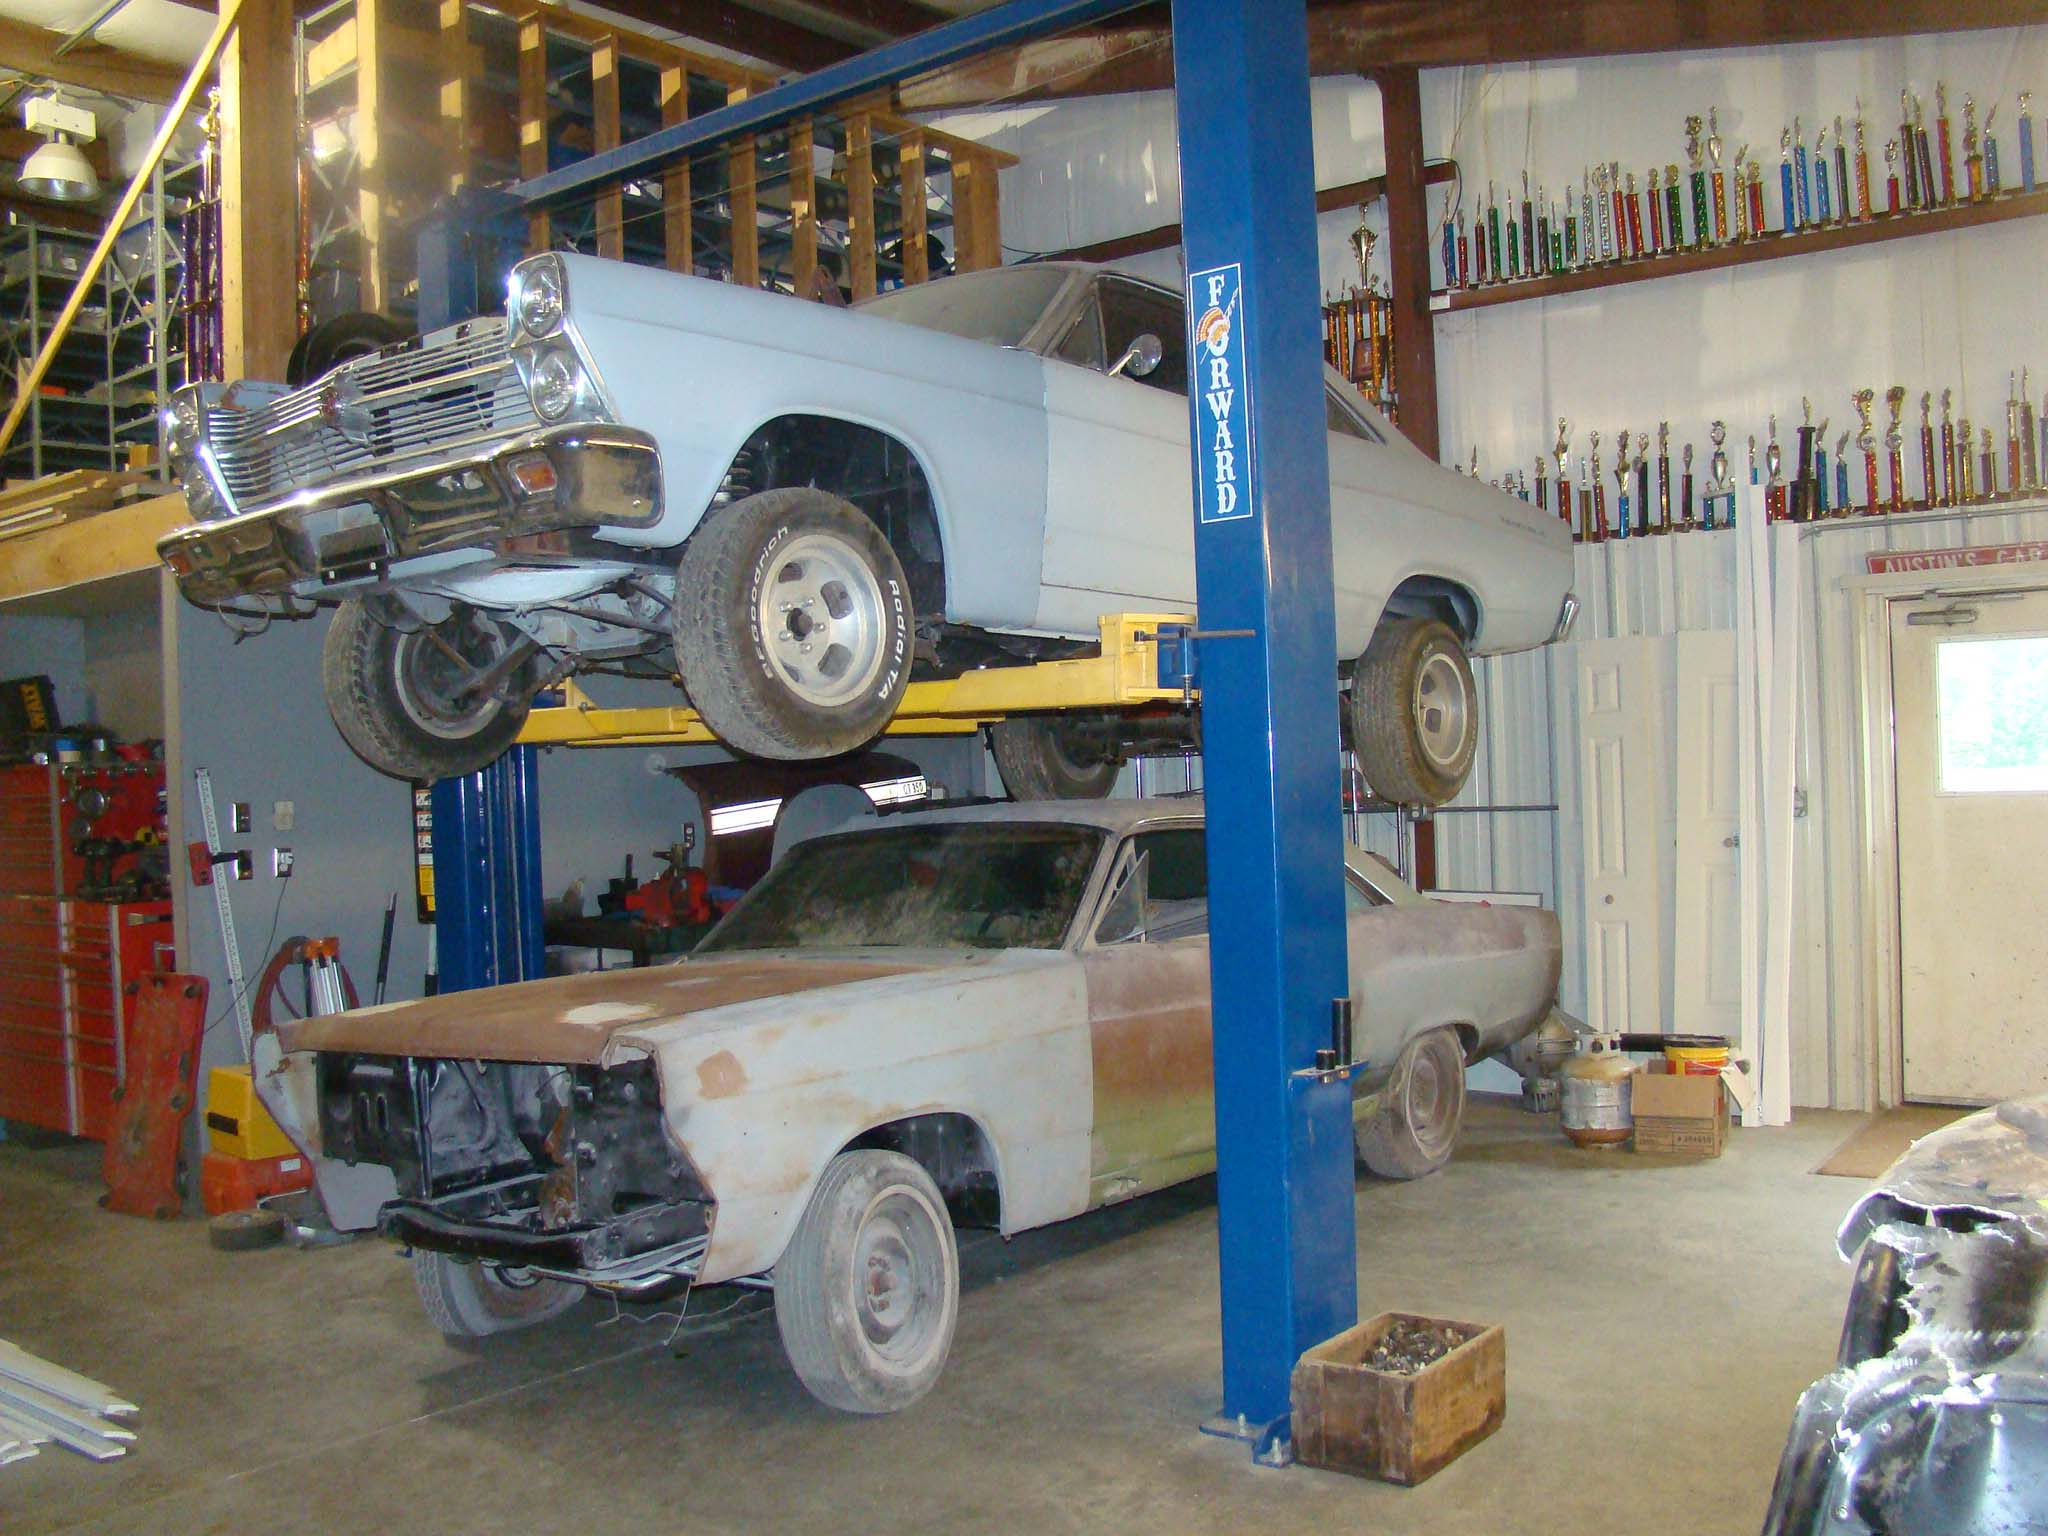 002 Cushman 1967 427 Ford Fairlane On Lift